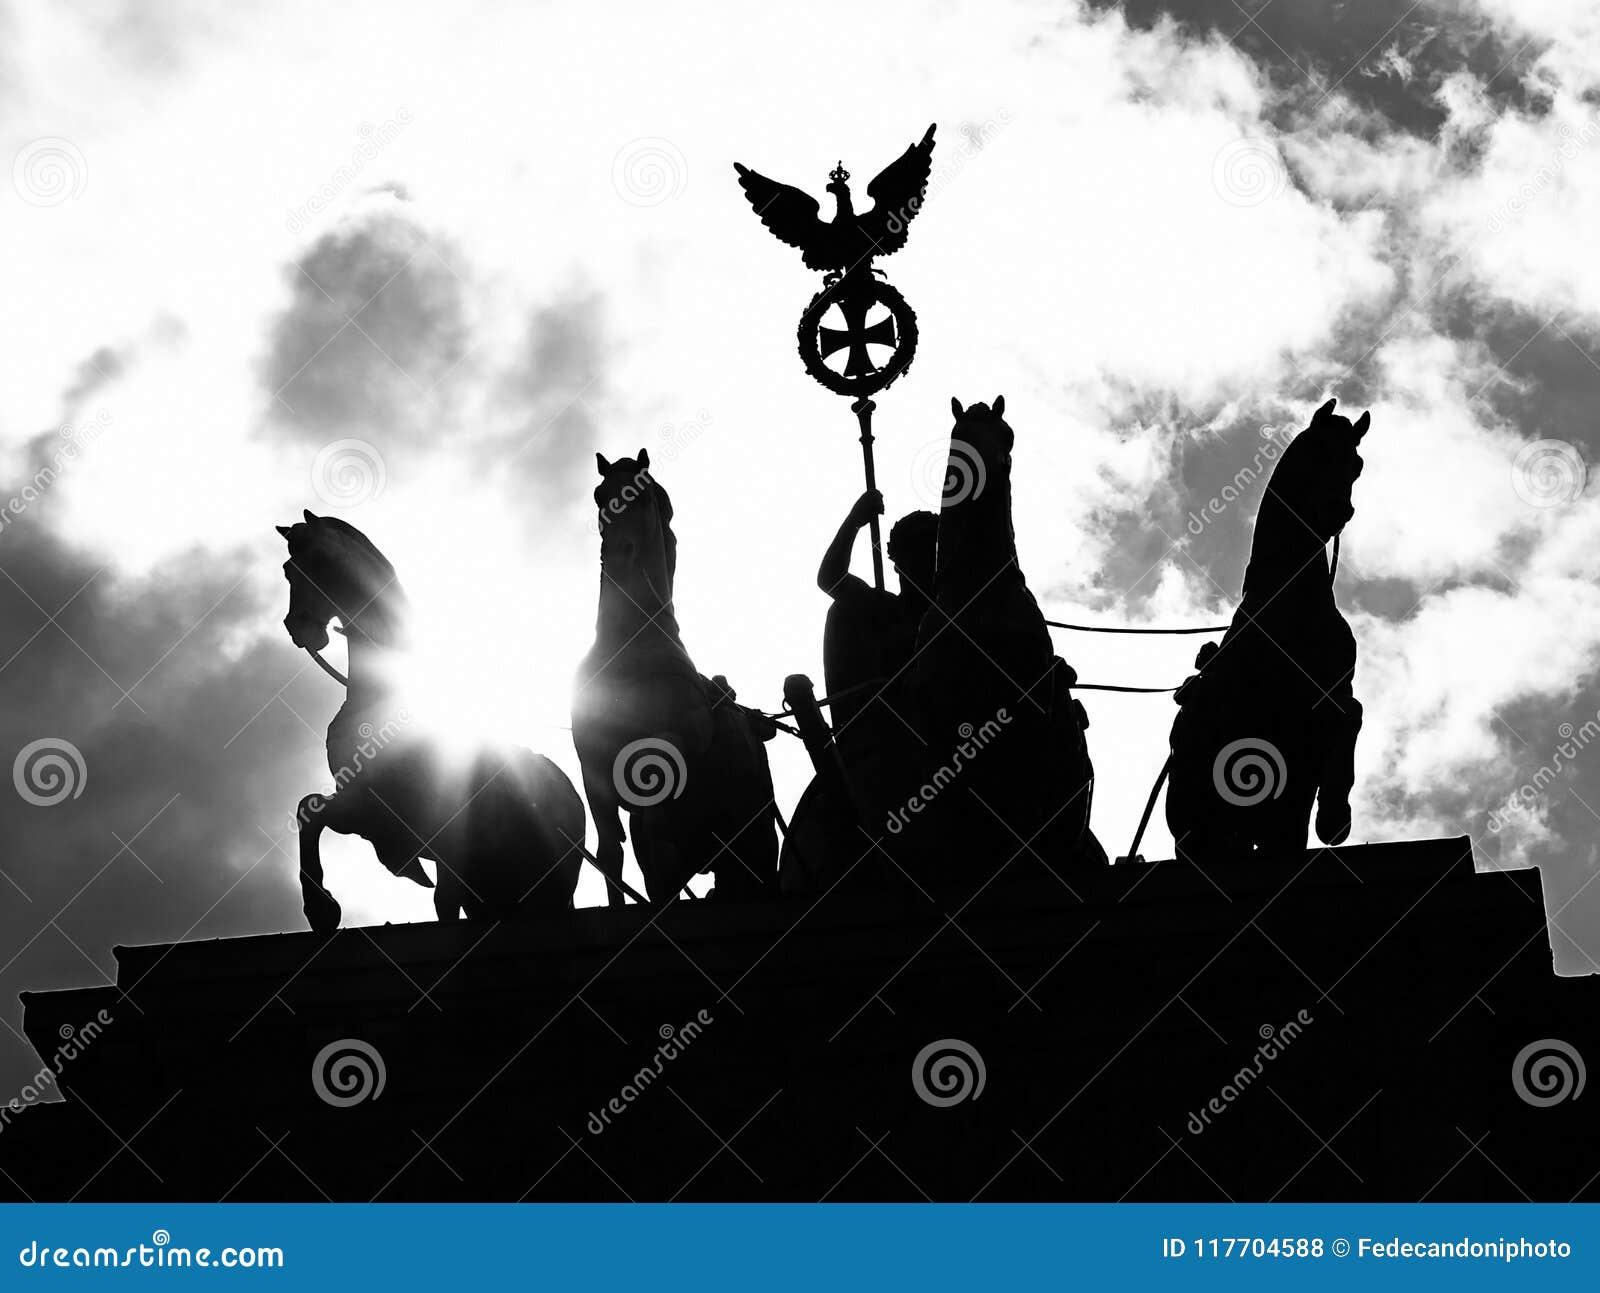 Quadriga With The Symbol Of The Roman Empire Of The Brandenburg